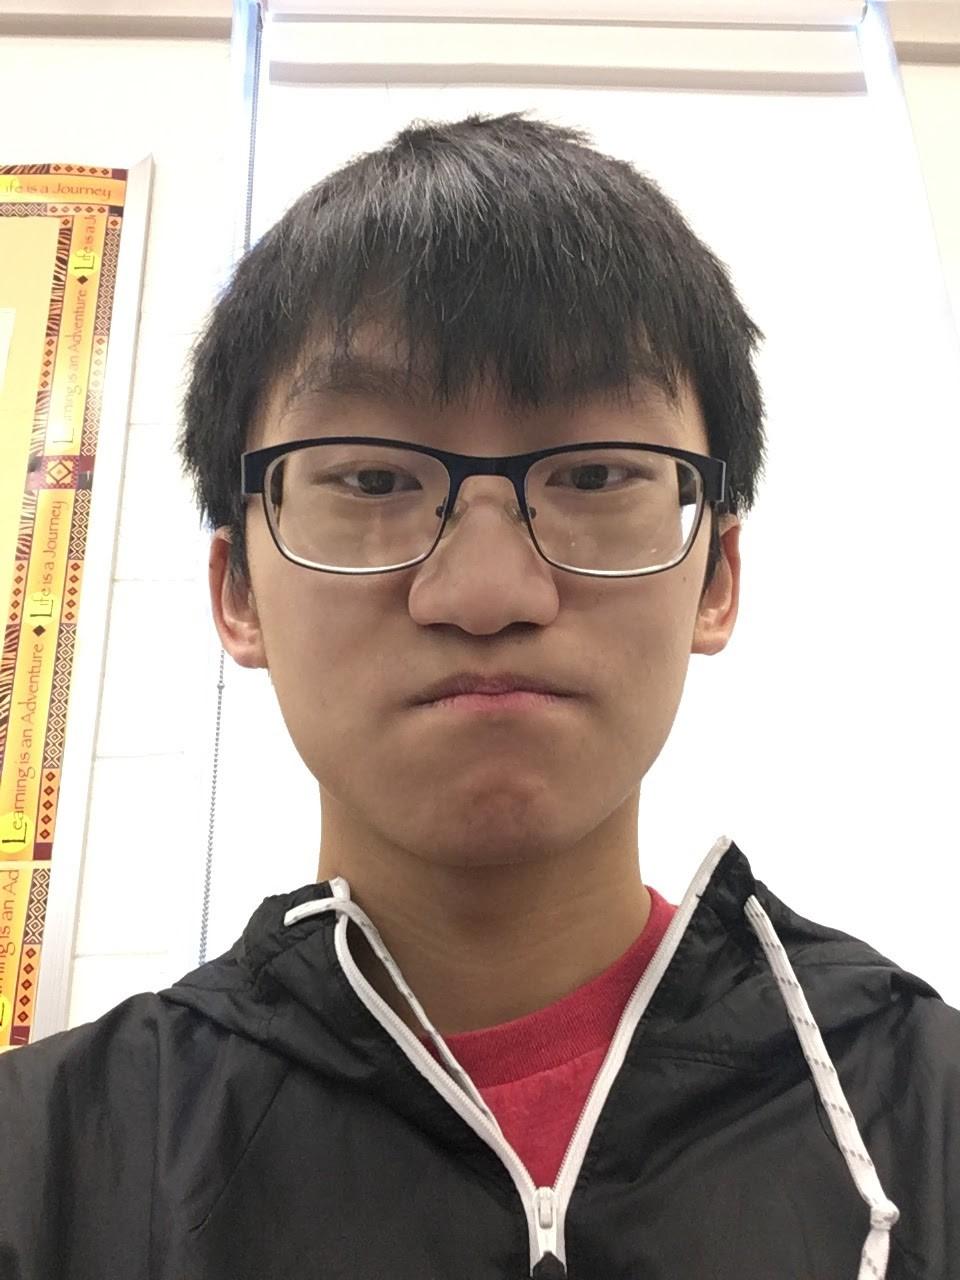 Johnathan Chang